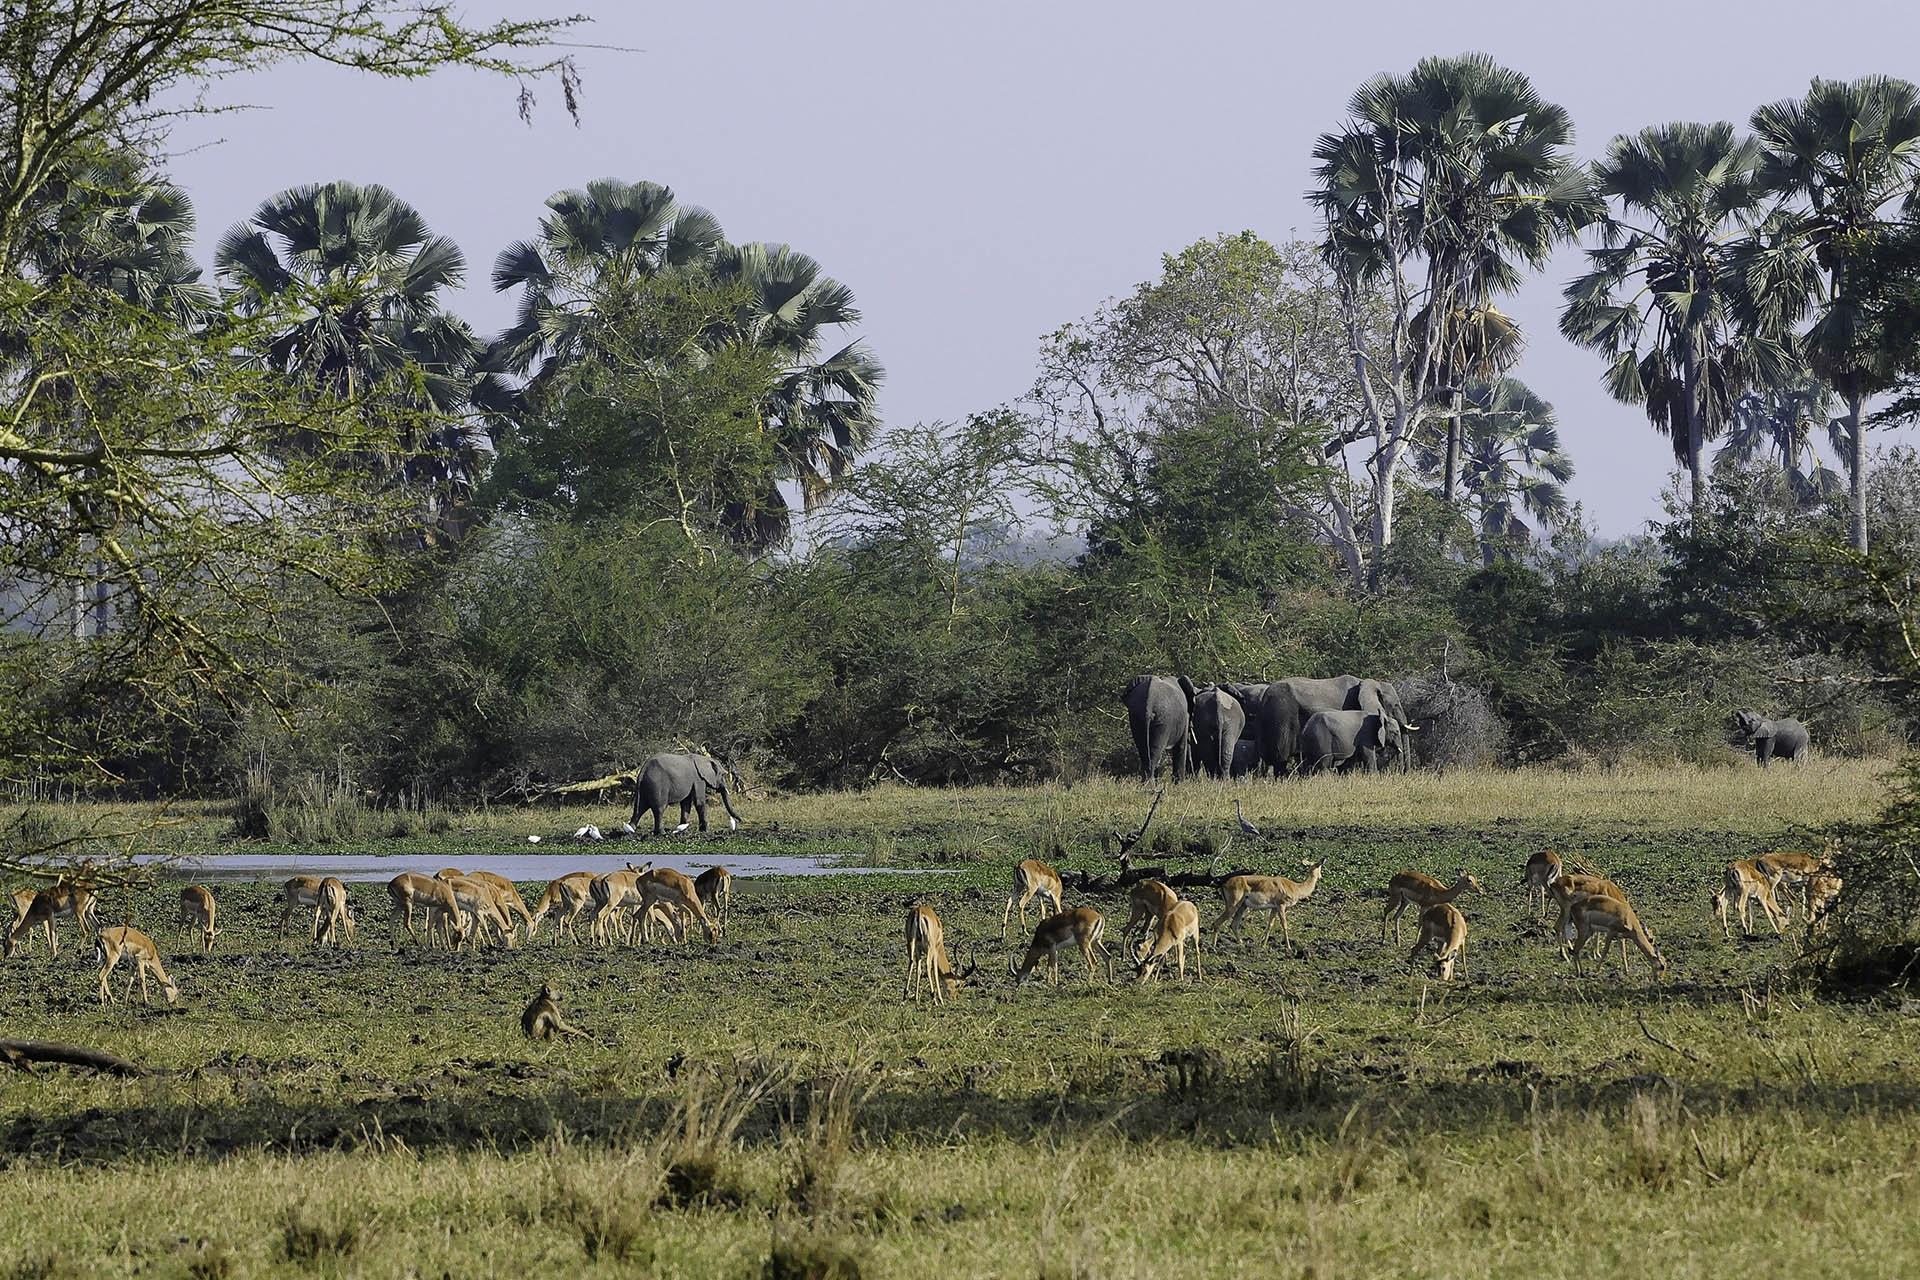 zomba plateau tours malawian-style-malawi-adventures-experiences-specialist-tour-operator-mvuu-wildlife